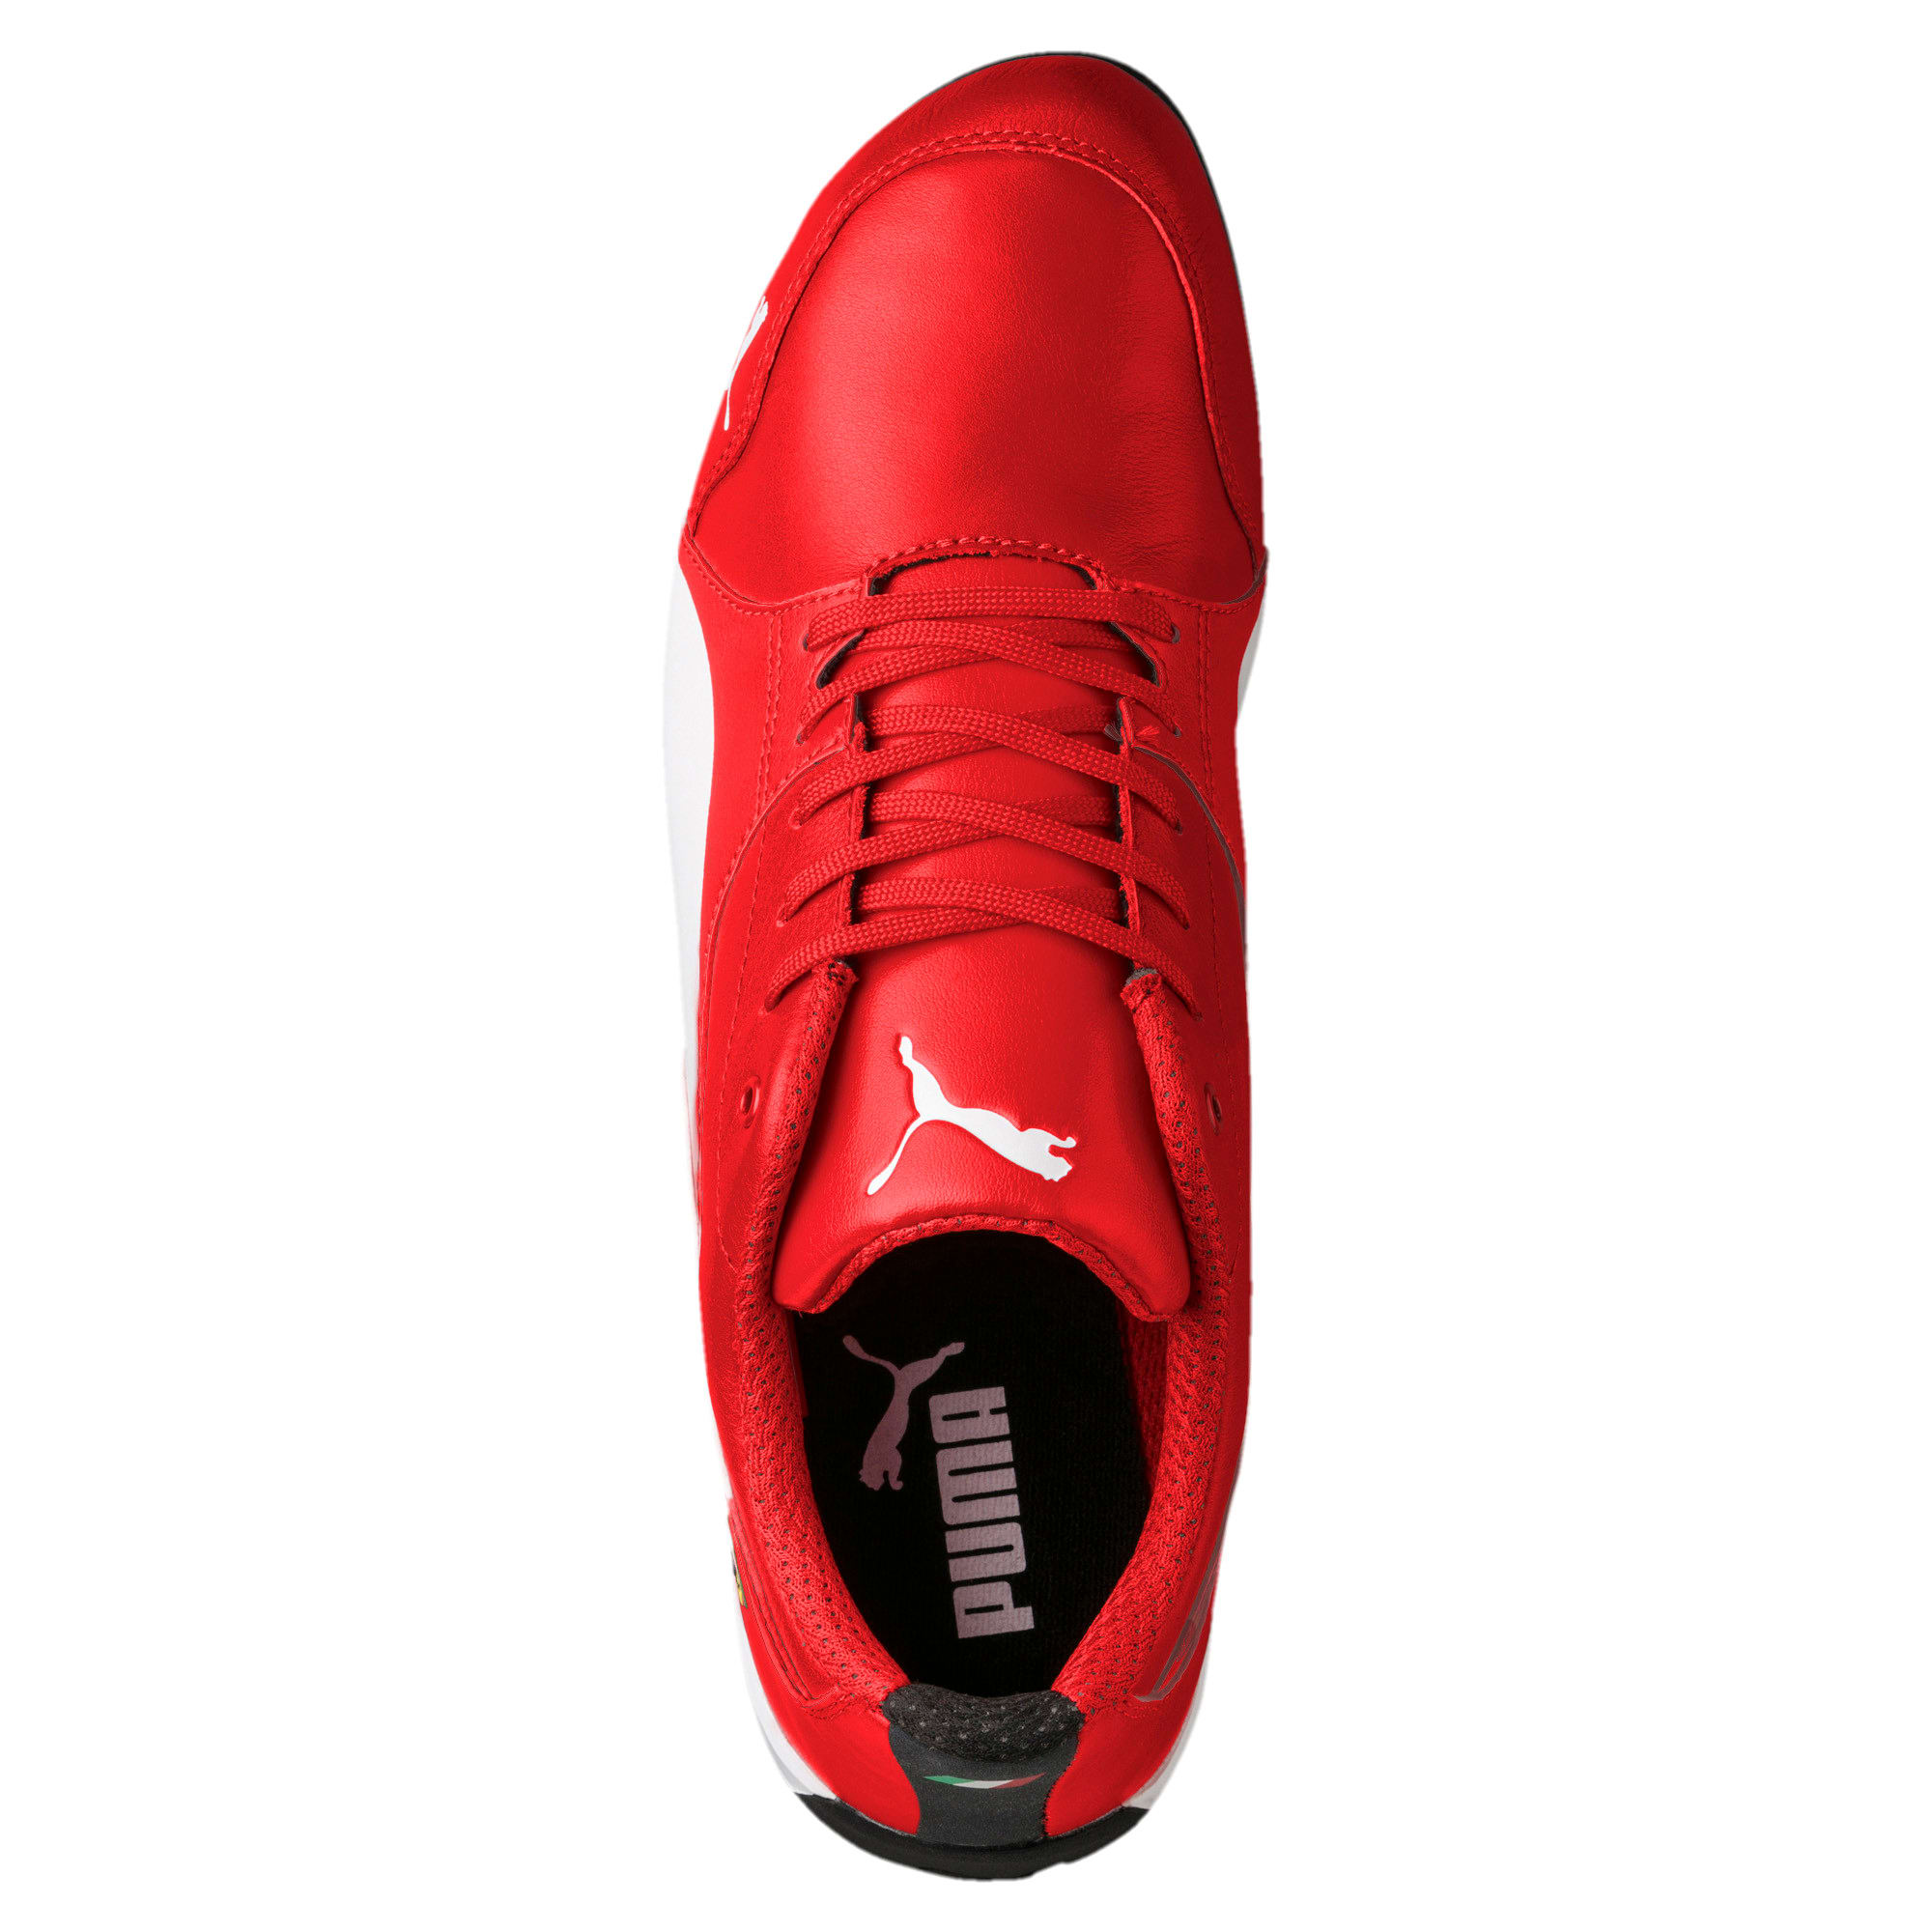 Thumbnail 5 of Scuderia Ferrari Drift Cat 7 Shoes, Rosso Corsa-Puma White-Black, medium